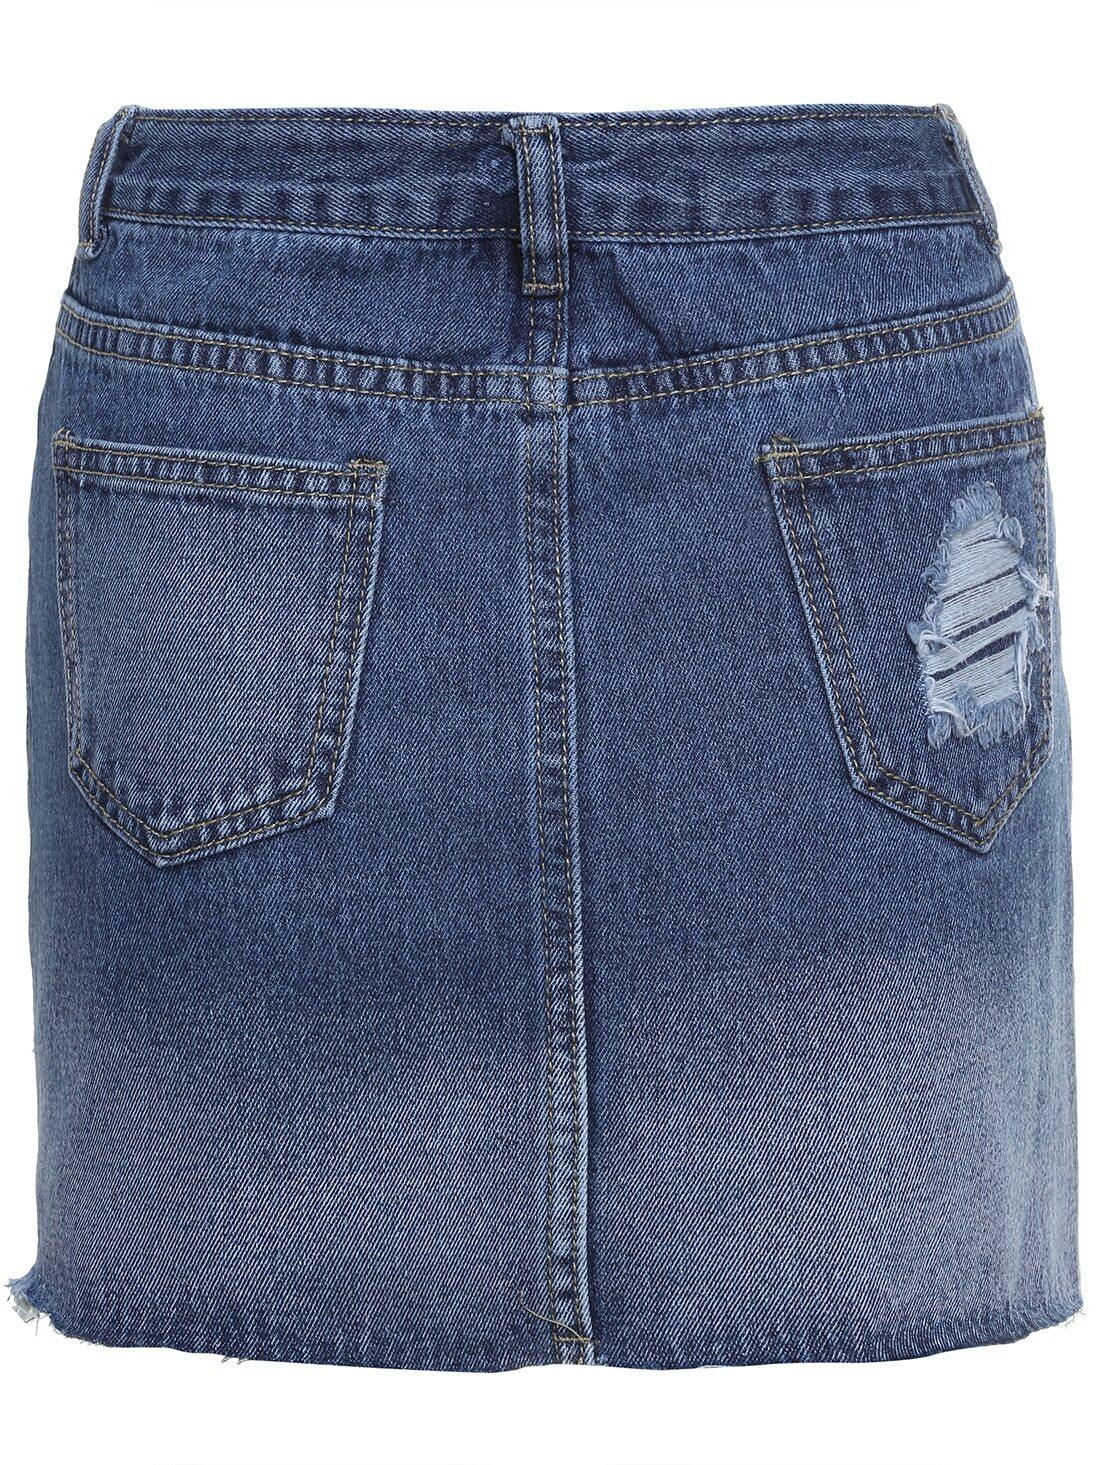 blue bleached ripped denim skirt shein sheinside